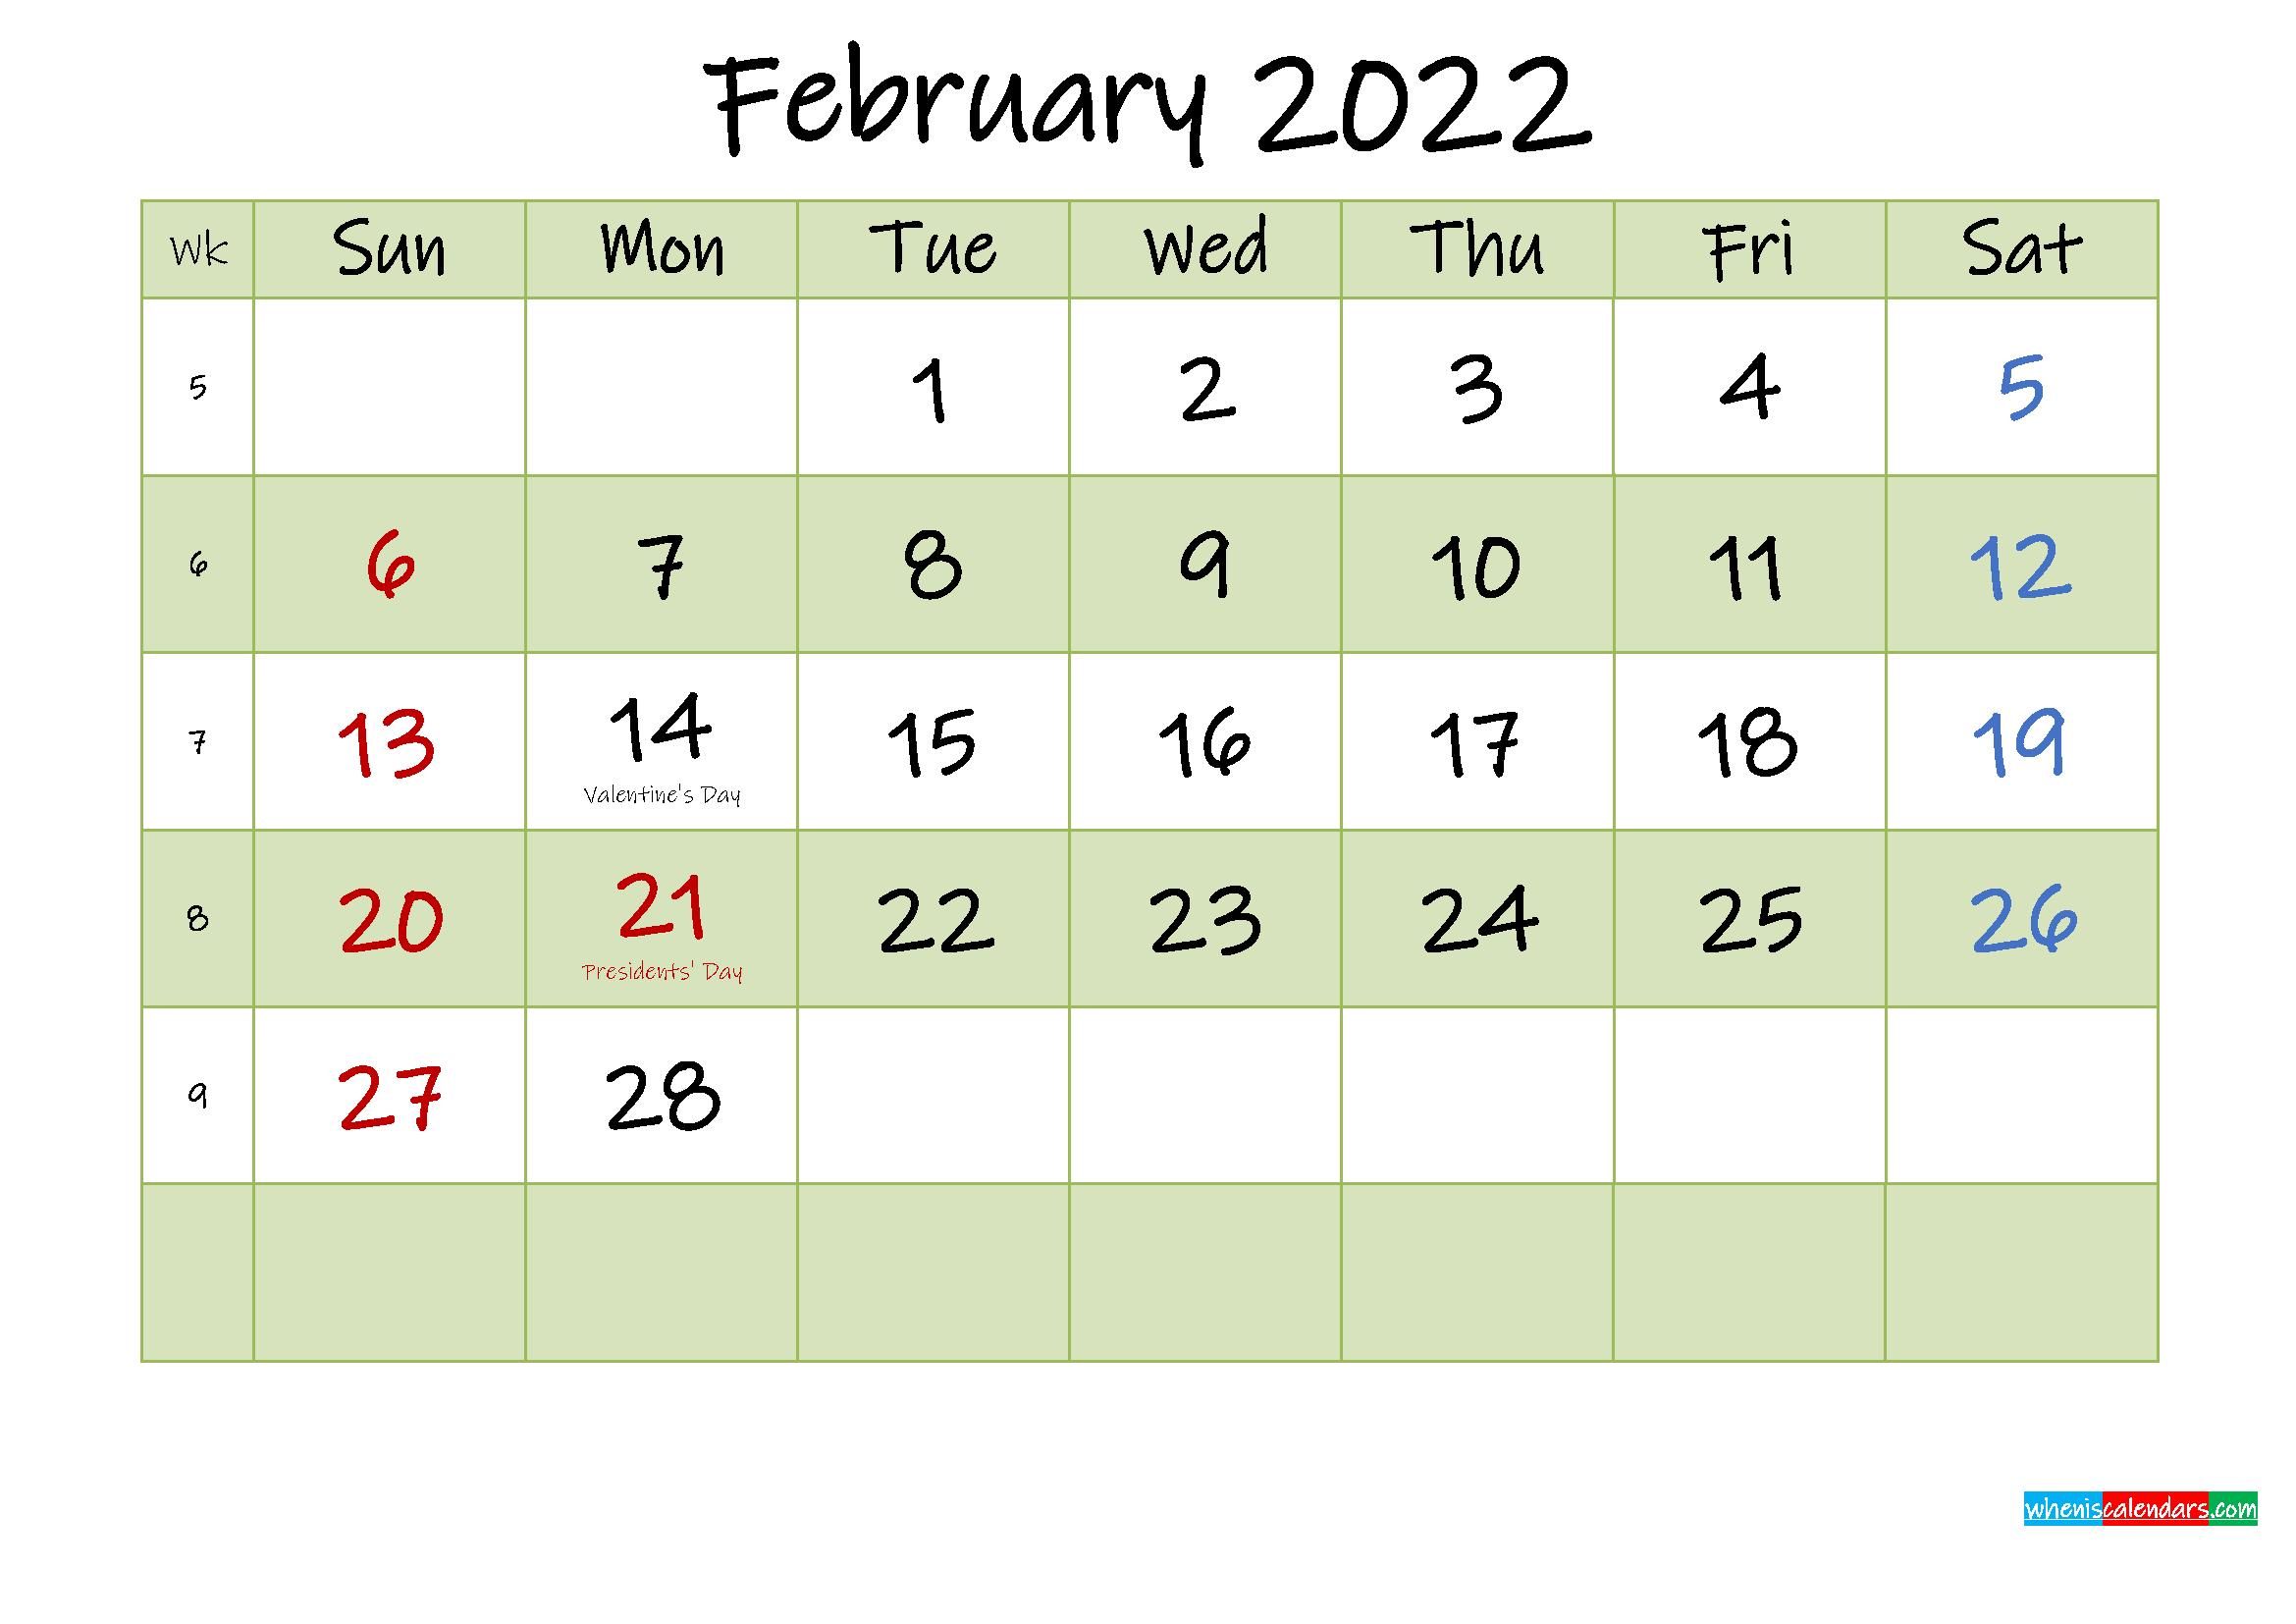 February 2022 Calendar With Holidays Printable - Template Inside Printable February 2022 Calendar